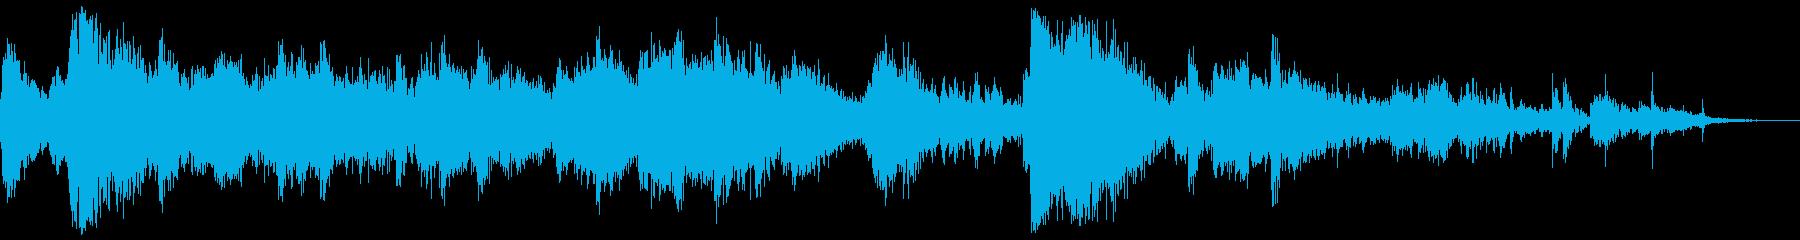 RVキャンパーがヒルサイドダウンで...の再生済みの波形